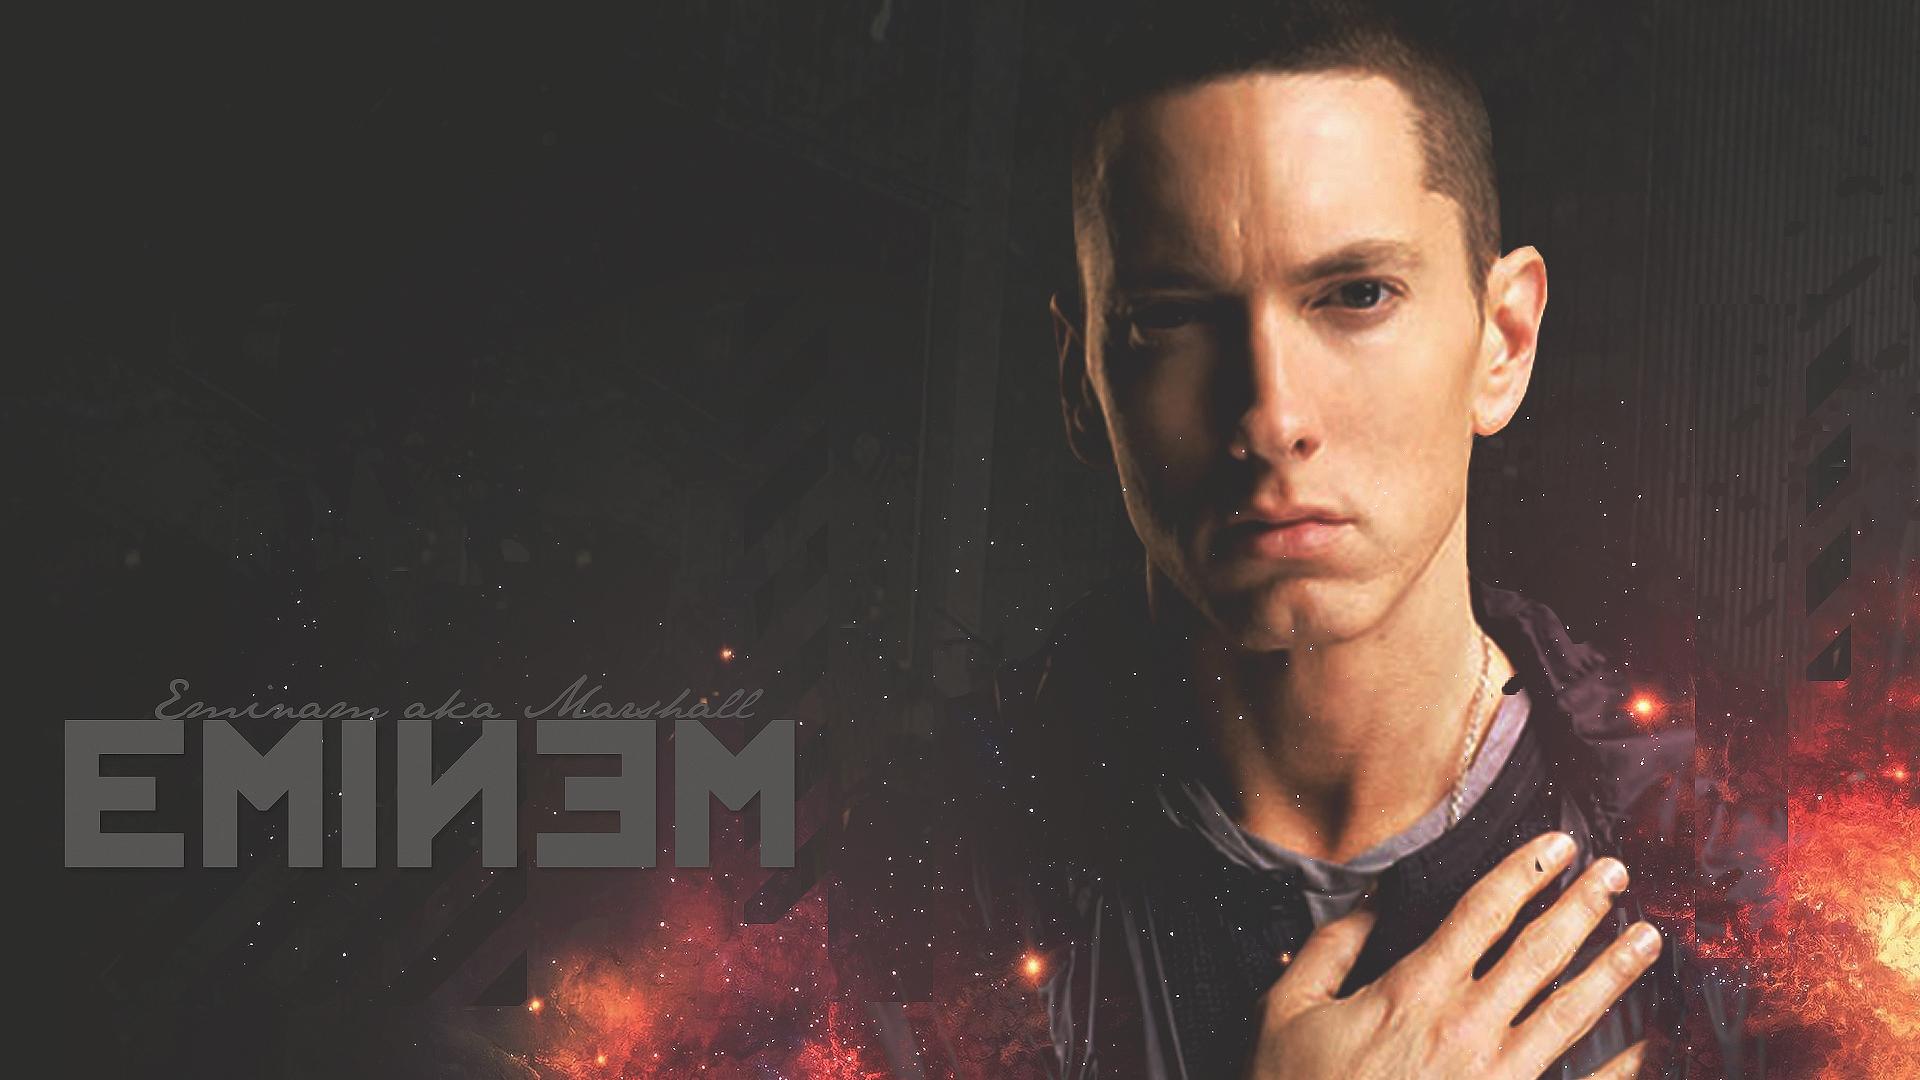 Eminem HD 4 Rap Wallpapers 1920x1080